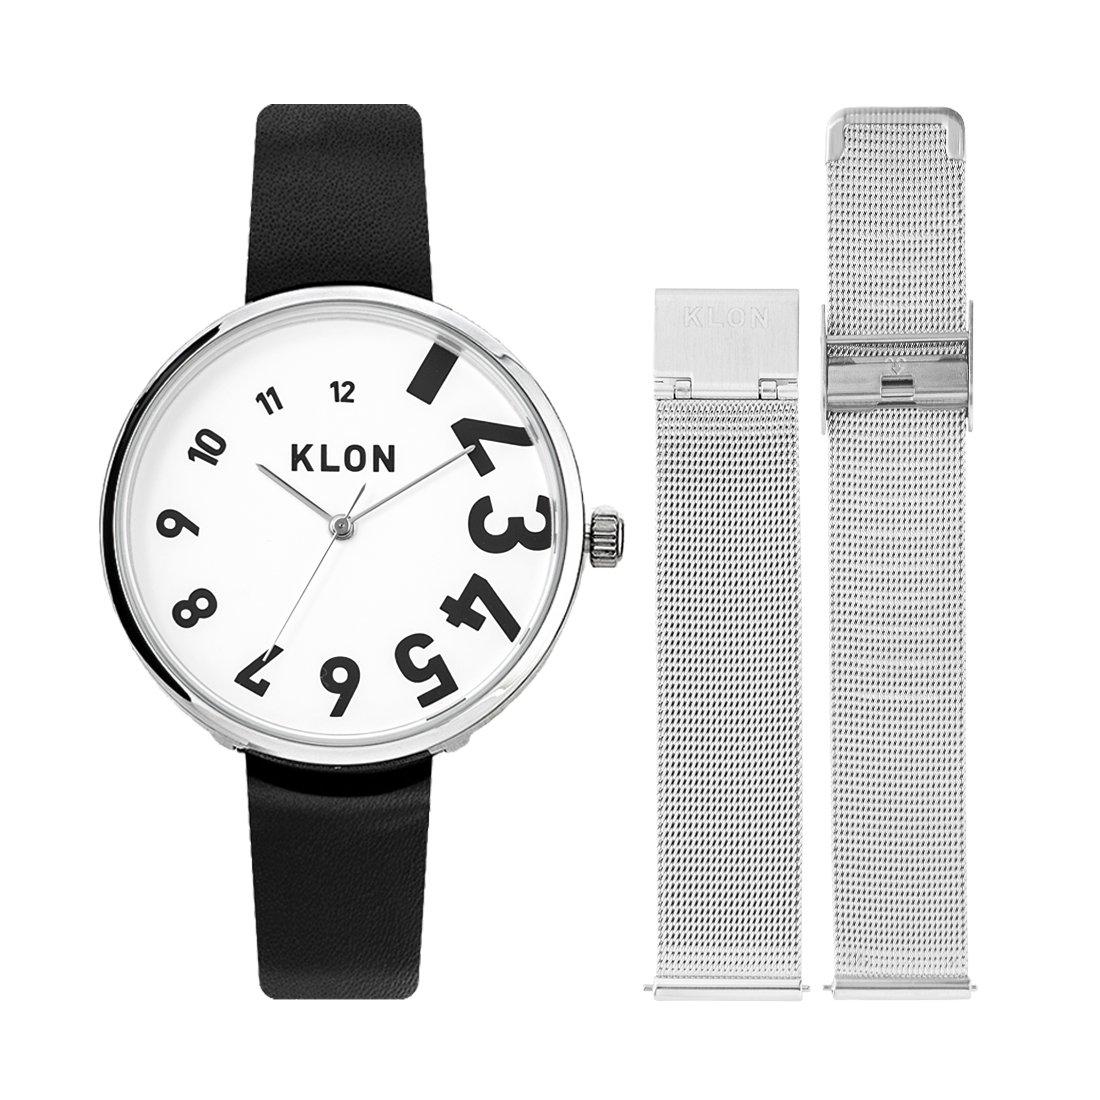 KLON EDDY TIME -REPLACE model- [38/W-FACE]